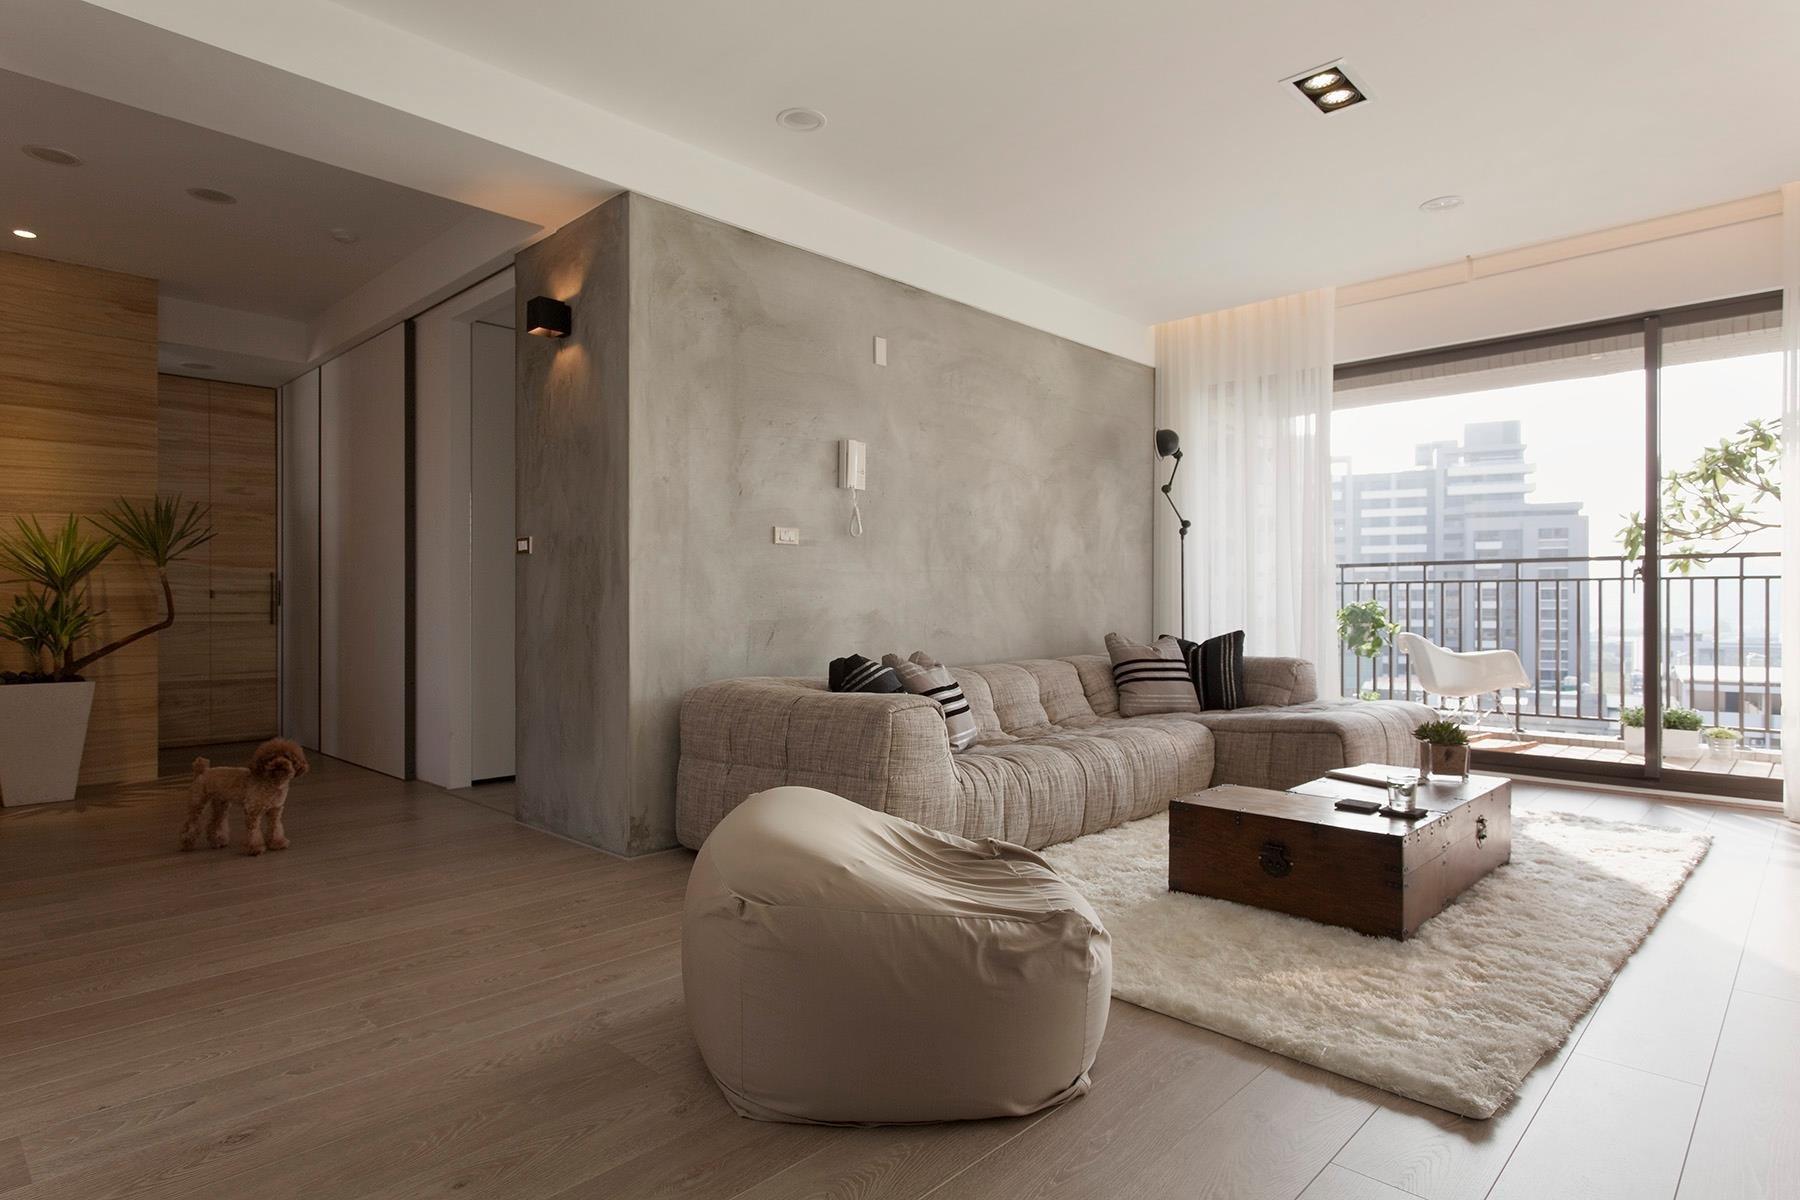 Comfortable Living Room Minimalist Elegant fortable Contemporary Decor